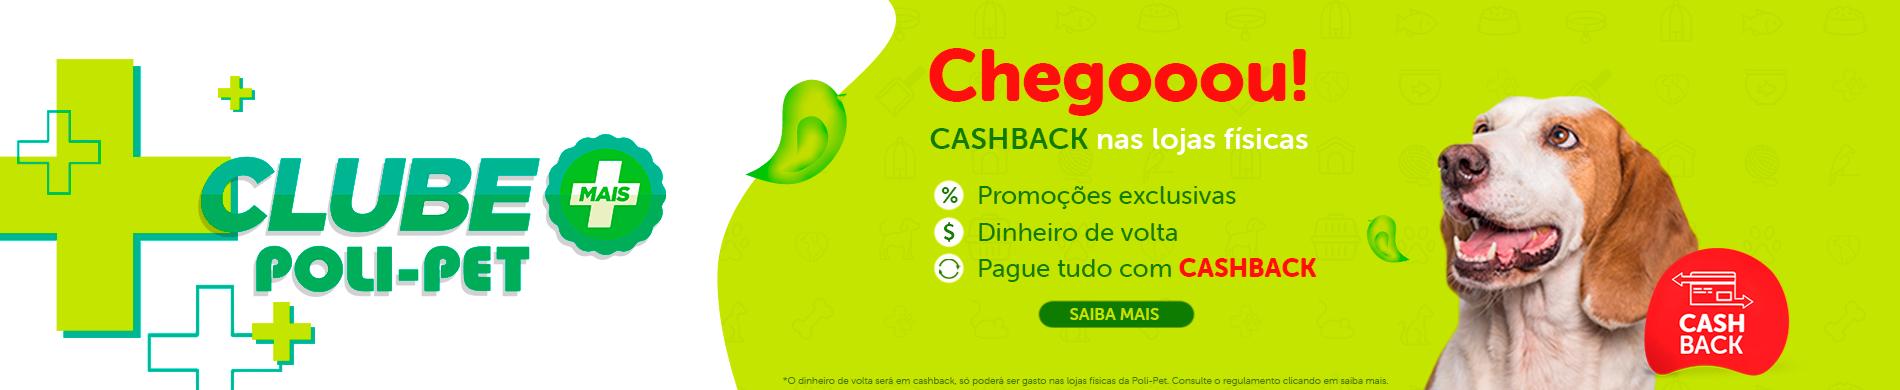 Clube Mais Cash Back